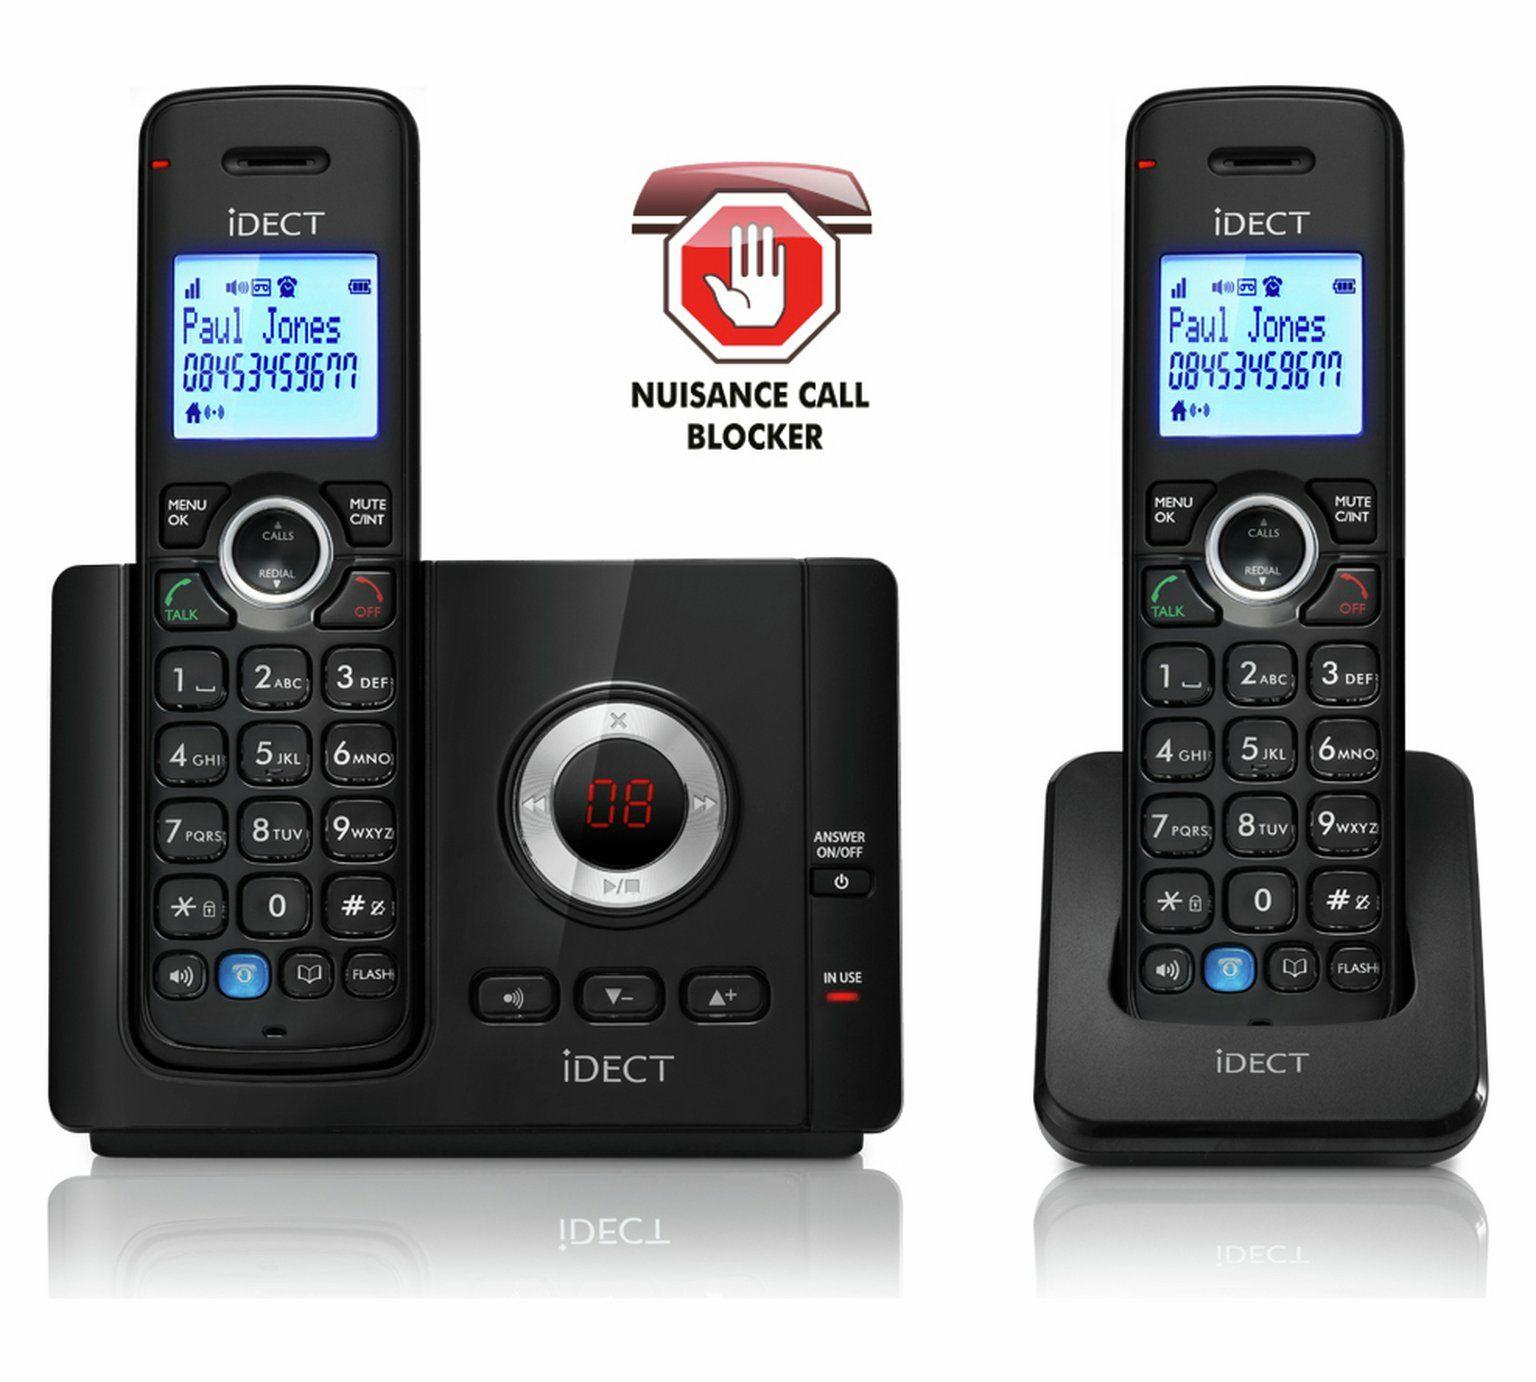 Binatone idect vantage 9325 twin cordless phone £40 instore @ Asda